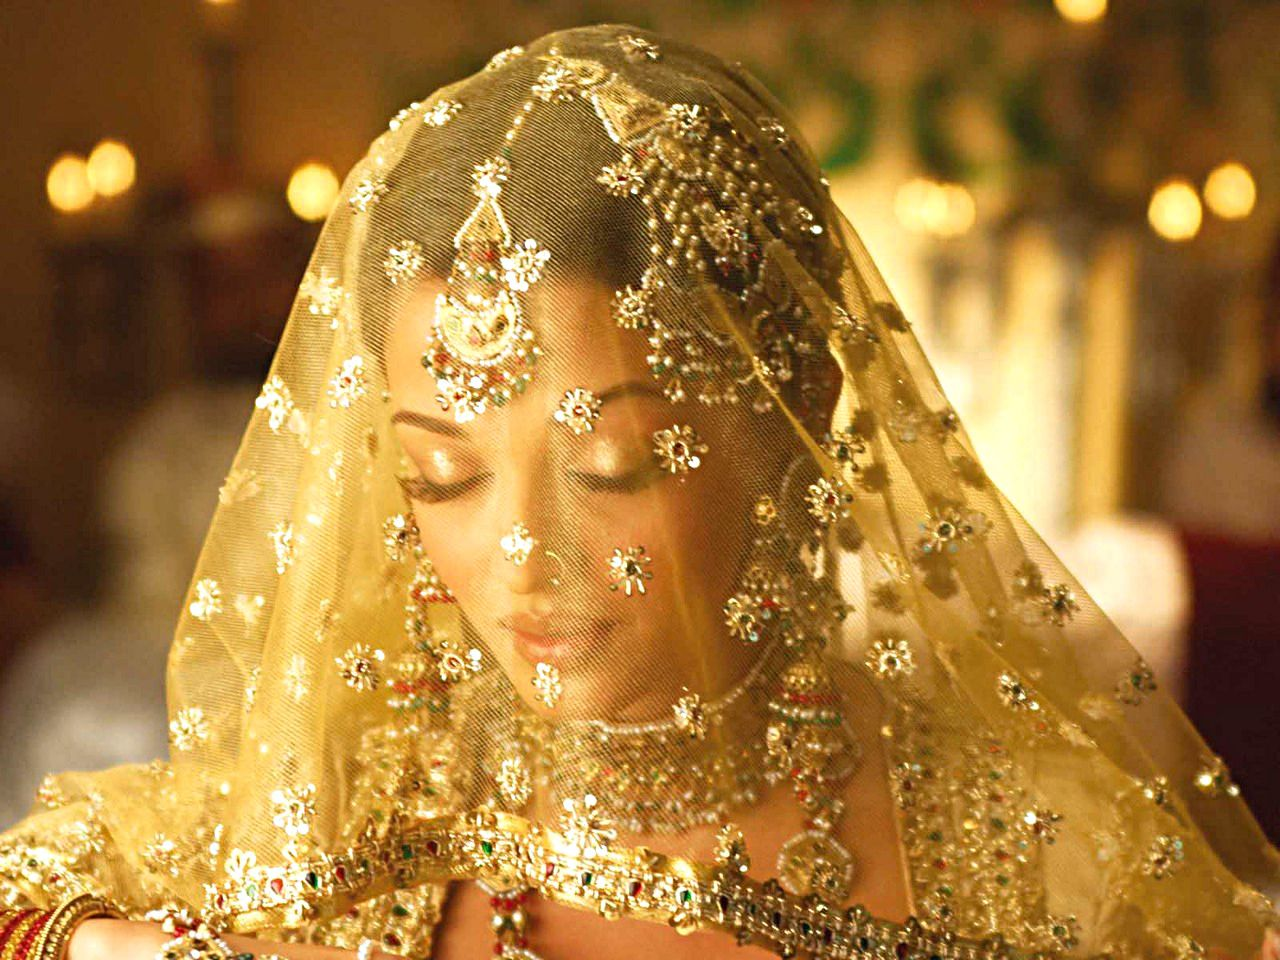 Aishwarya rai wedding dress  Pin by Claudiaus Cosmos on Ethnic Diversityy ud You u Me  Pinterest